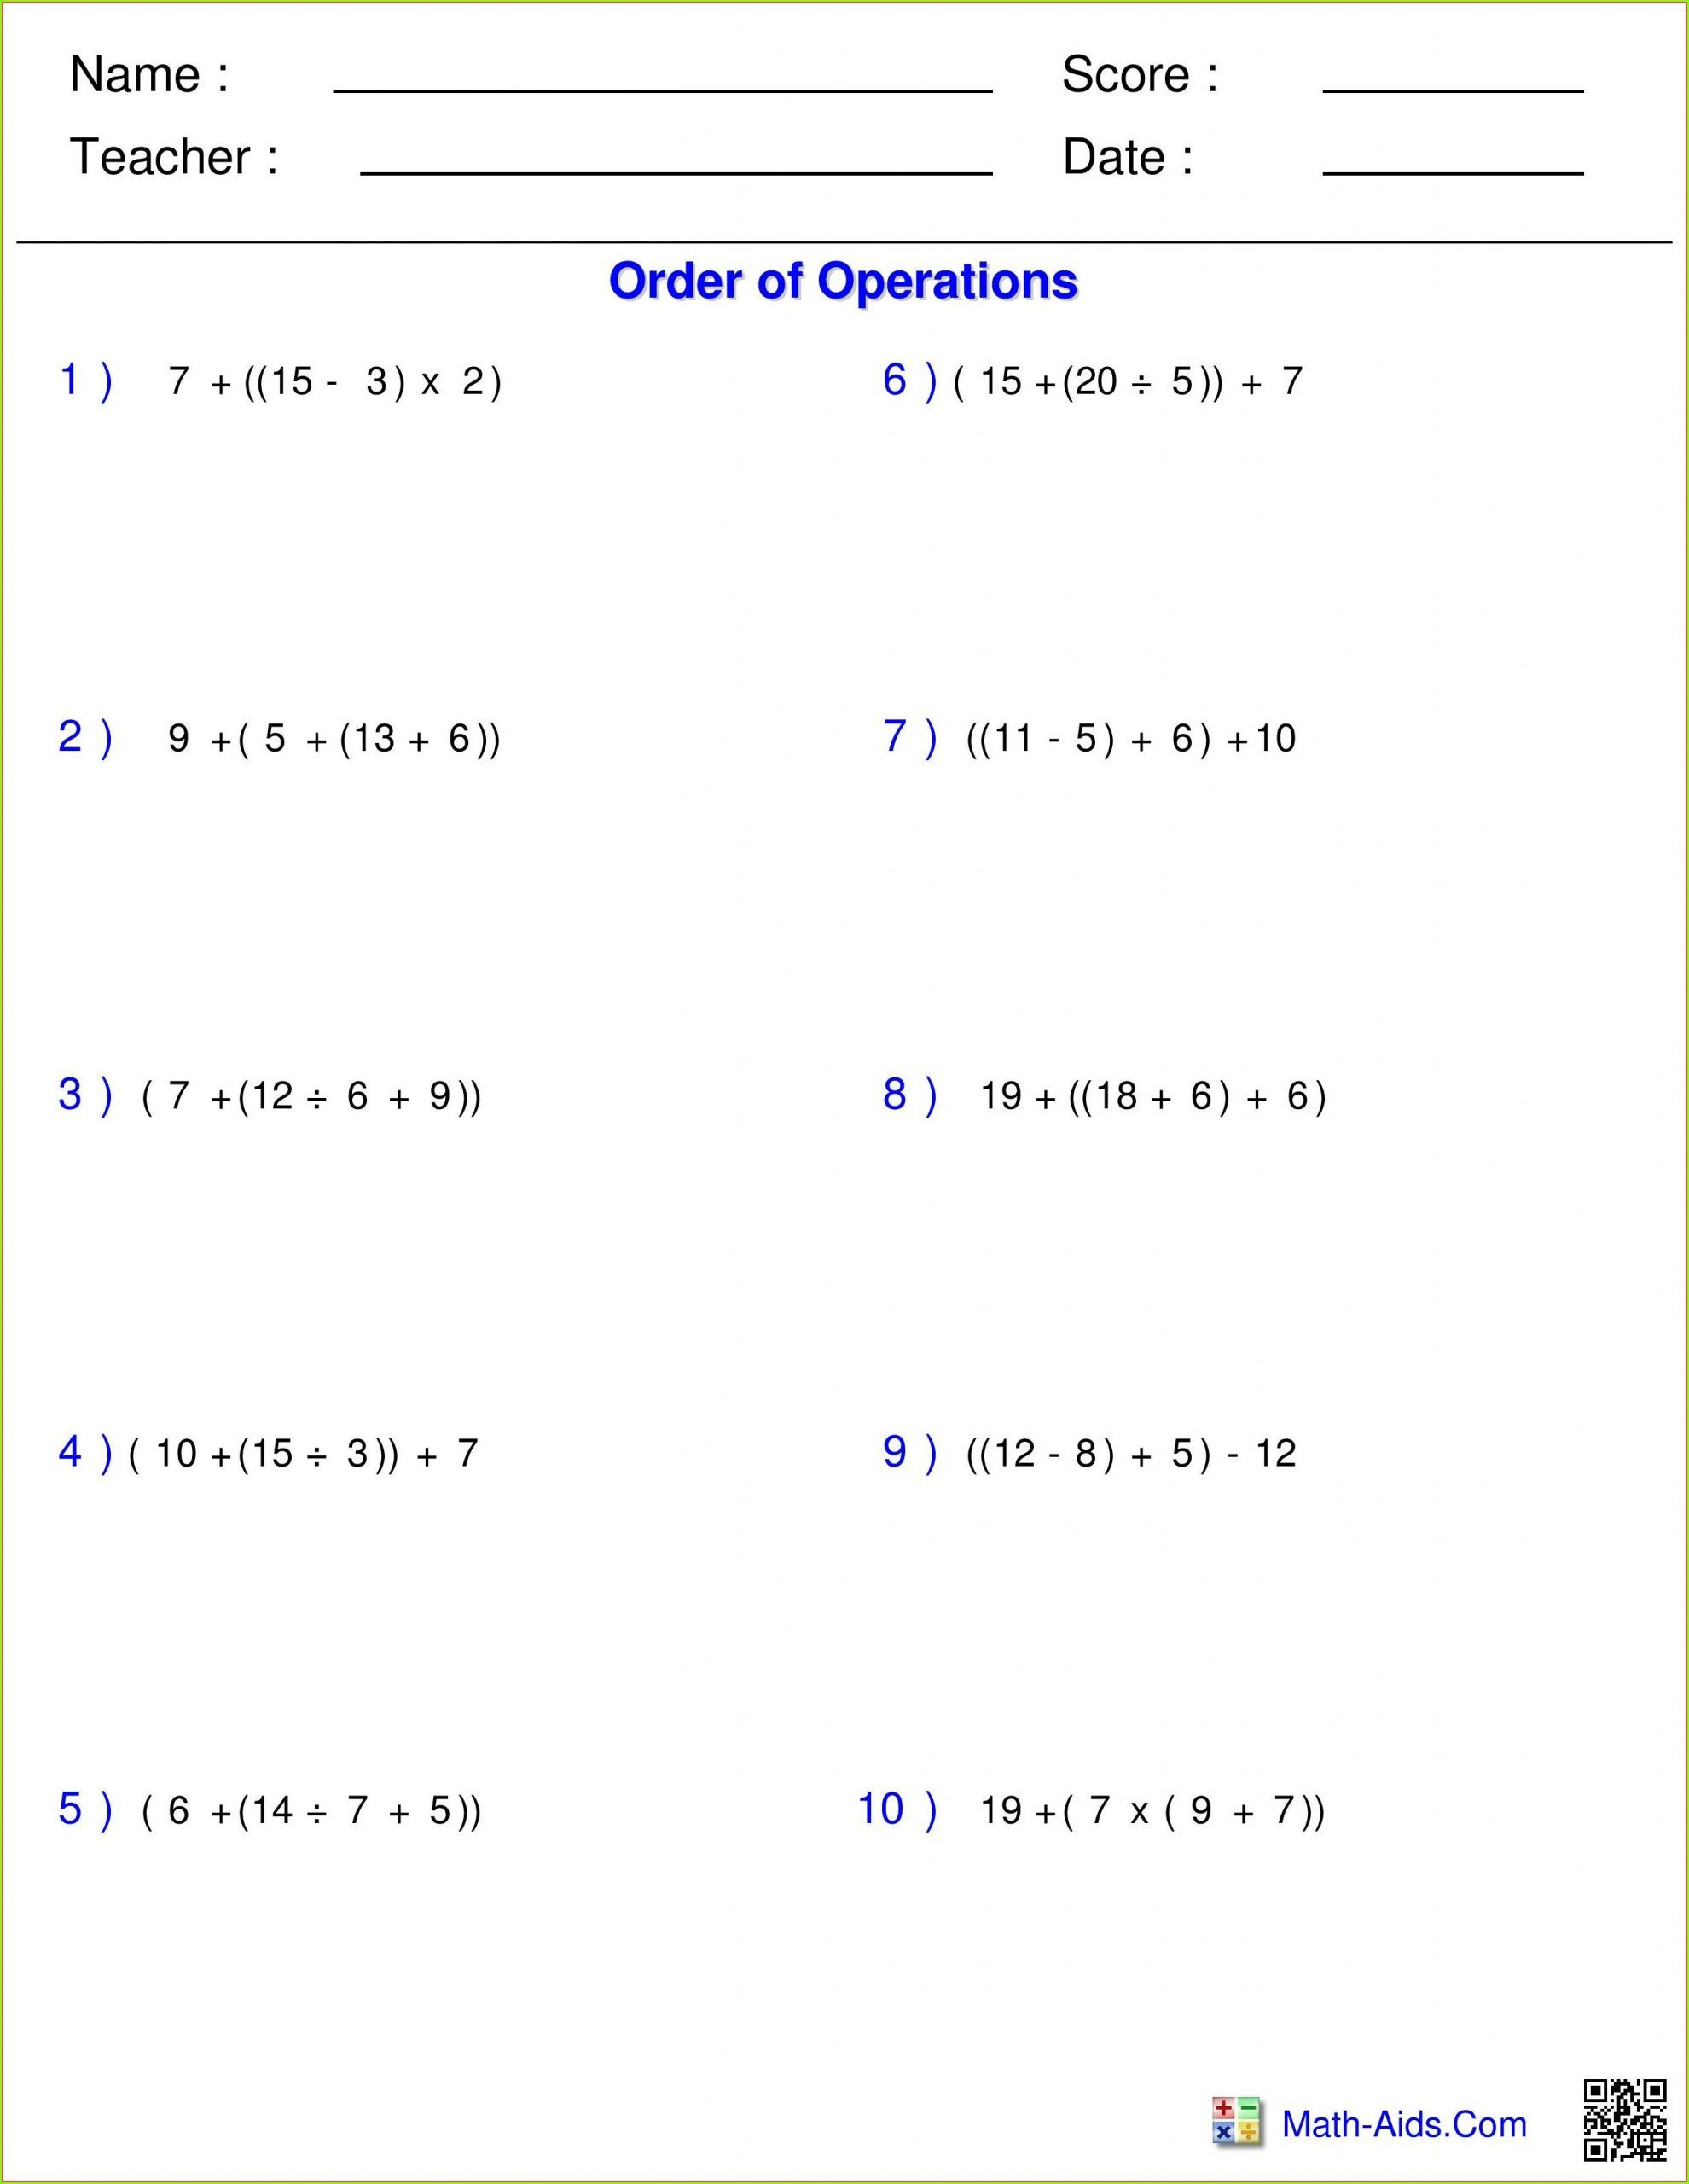 5th Grade Pemdas Worksheets Order Of Operations Pemdas Worksheets Fraction Word Problems